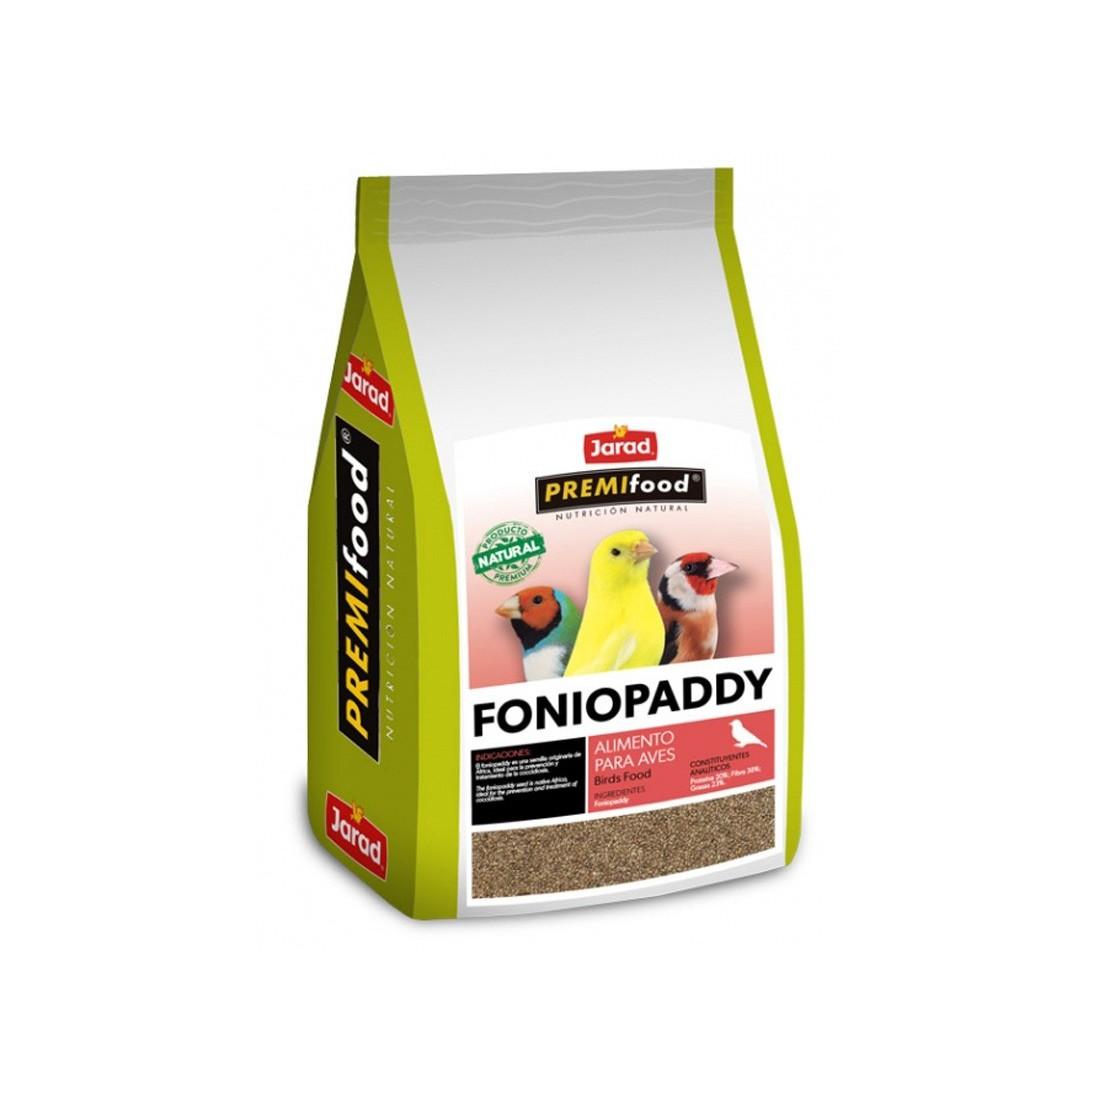 FINIOPADDY PREMIFOOD